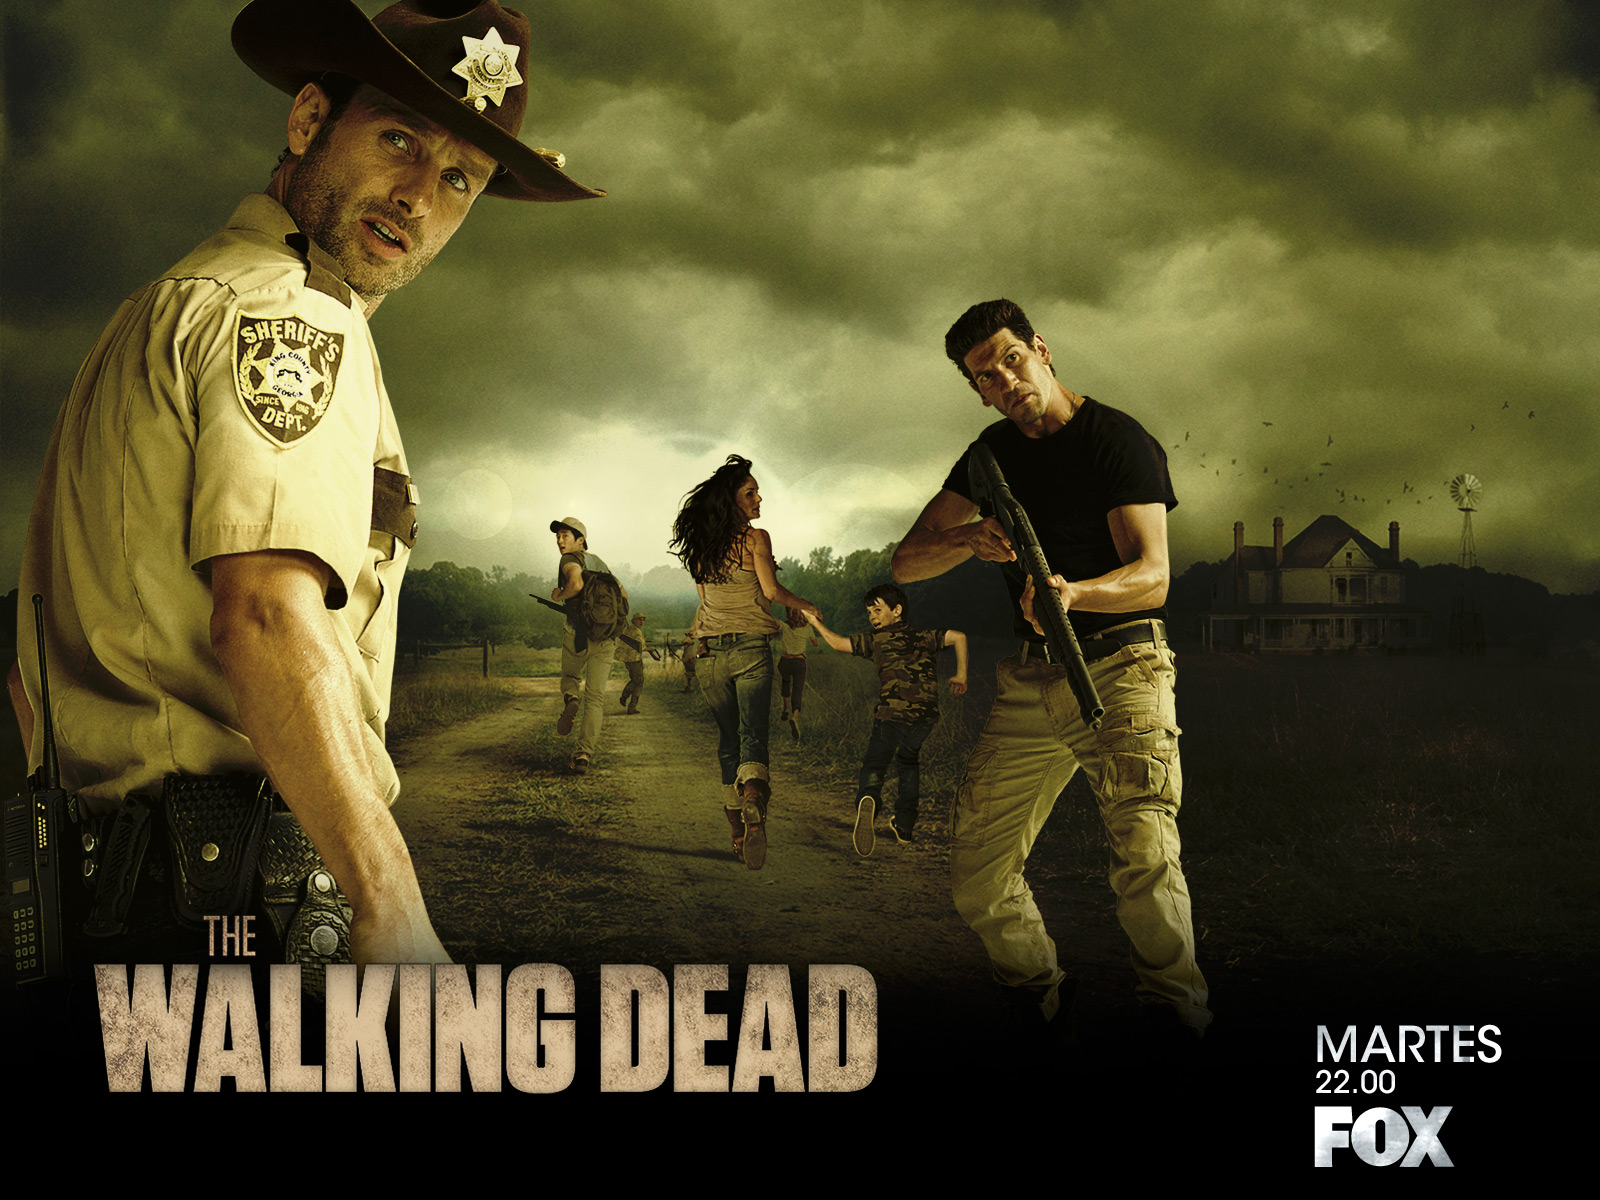 The Walking Dead (Temporada 2) HD 1080P LATINO/INGLES